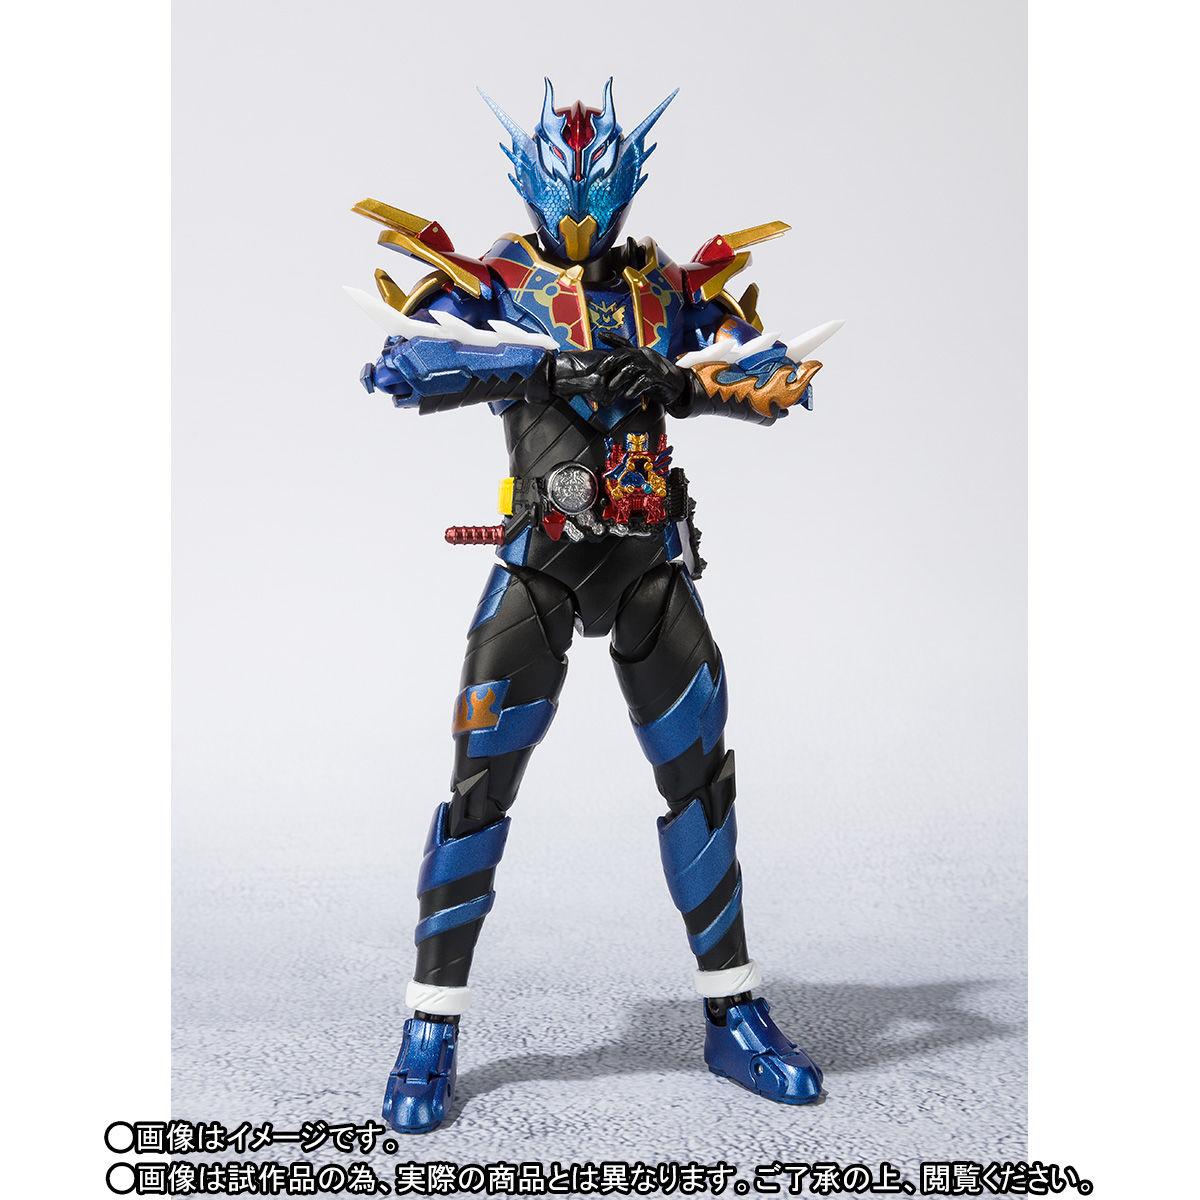 S.H.フィギュアーツ『仮面ライダーグレートクローズ』可動フィギュア-002